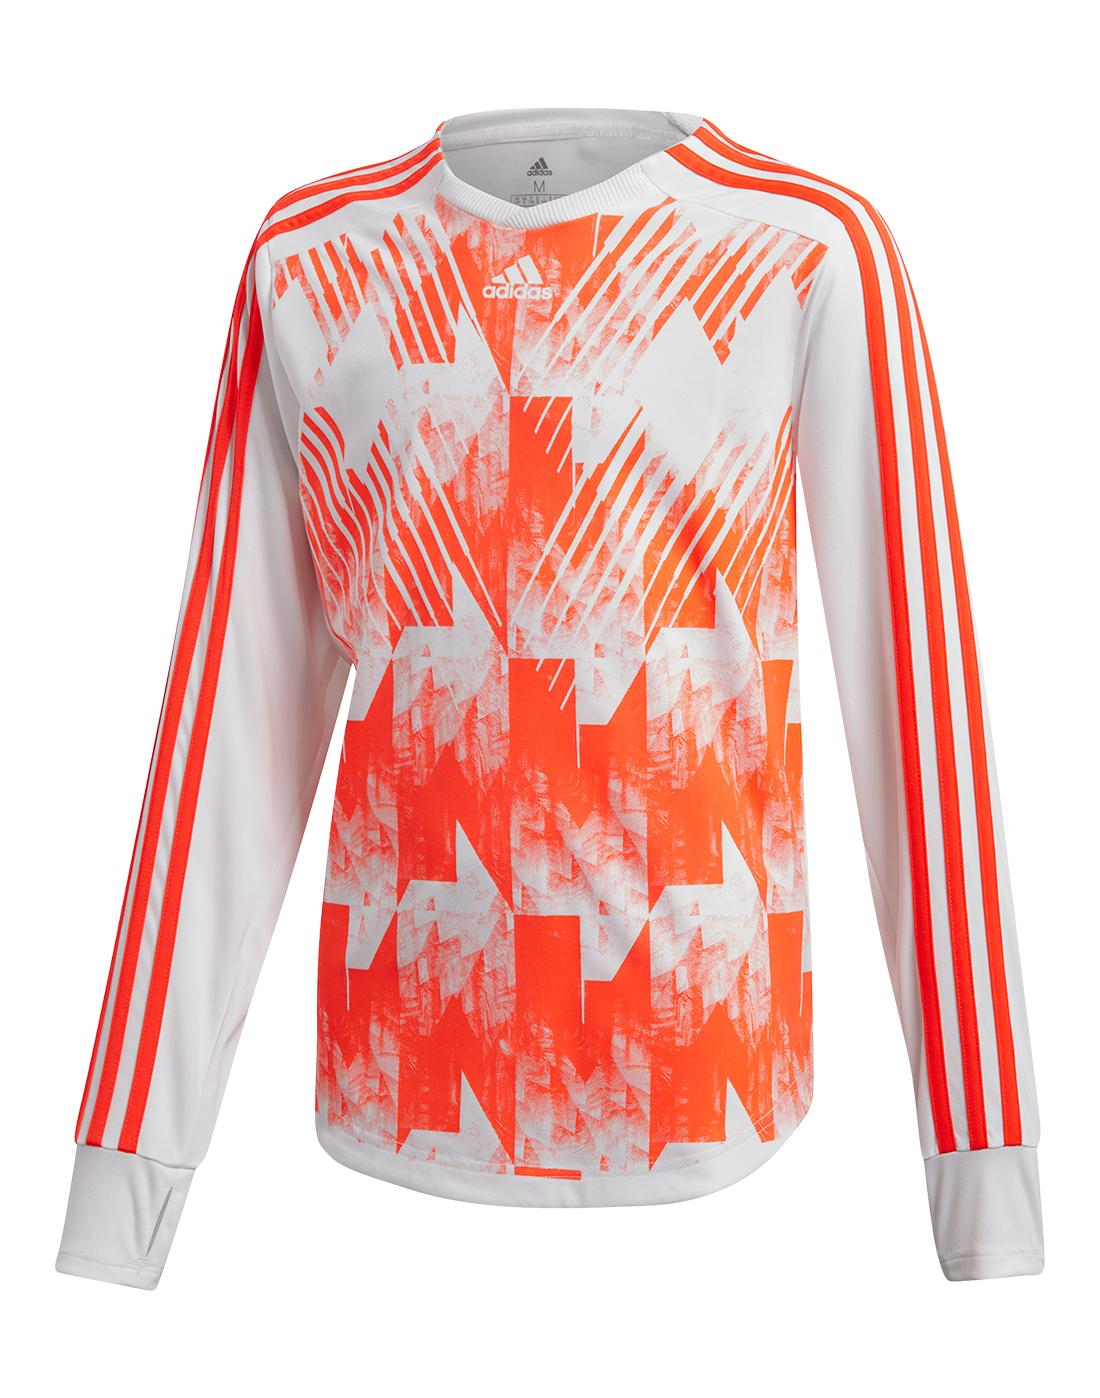 ee6abbe09fe5 Kid's Long Sleeve adidas Predator Jersey | Orange | Life Style Sports